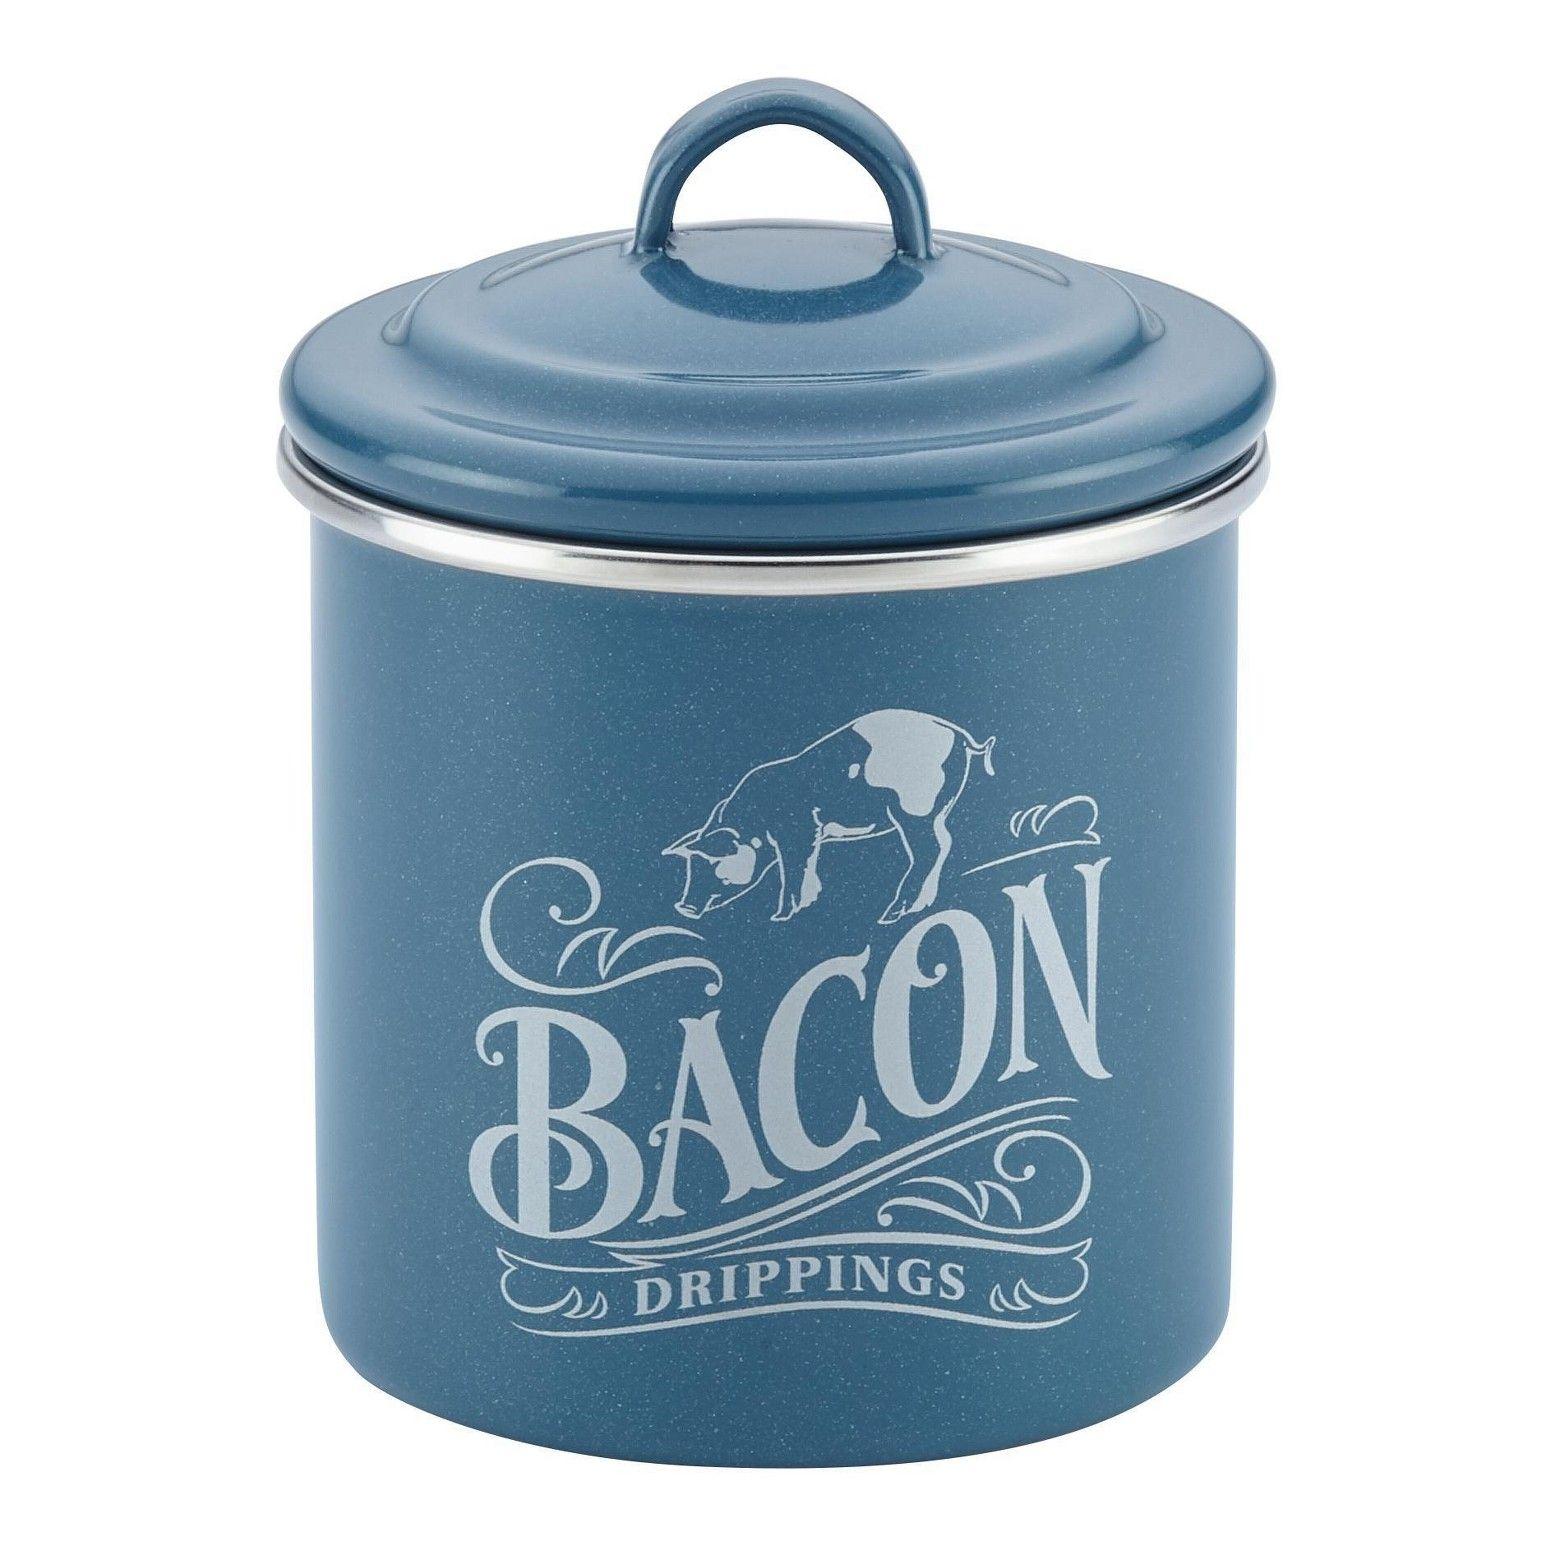 Ayesha Curry Enamel on Steel Bacon Food Storage Box | Ayesha curry ...